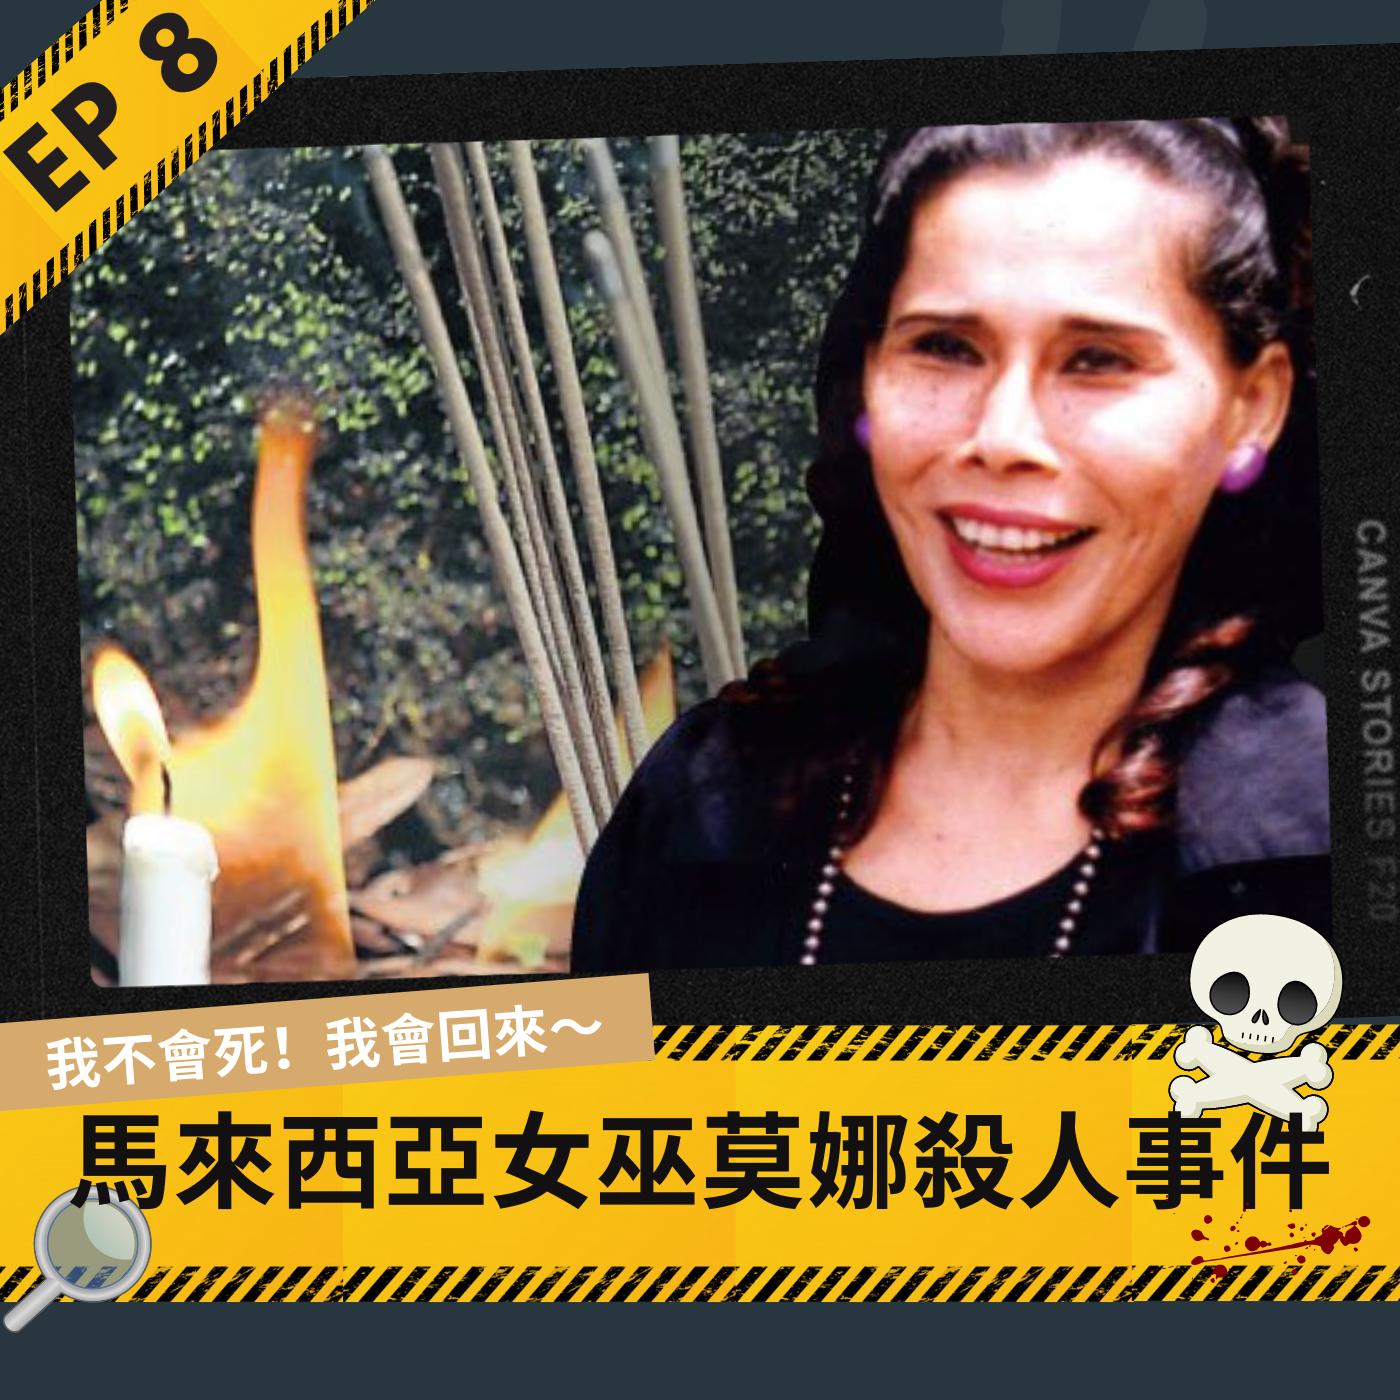 "EP 8- 馬來西亞犯罪史上最恐怖的女巫殺人事件!為了修煉更高的黑巫術,不惜殺害9個人, 被處死前還喊: ""我不會死! 我會回來~""...|【女巫莫娜殺人事件】"